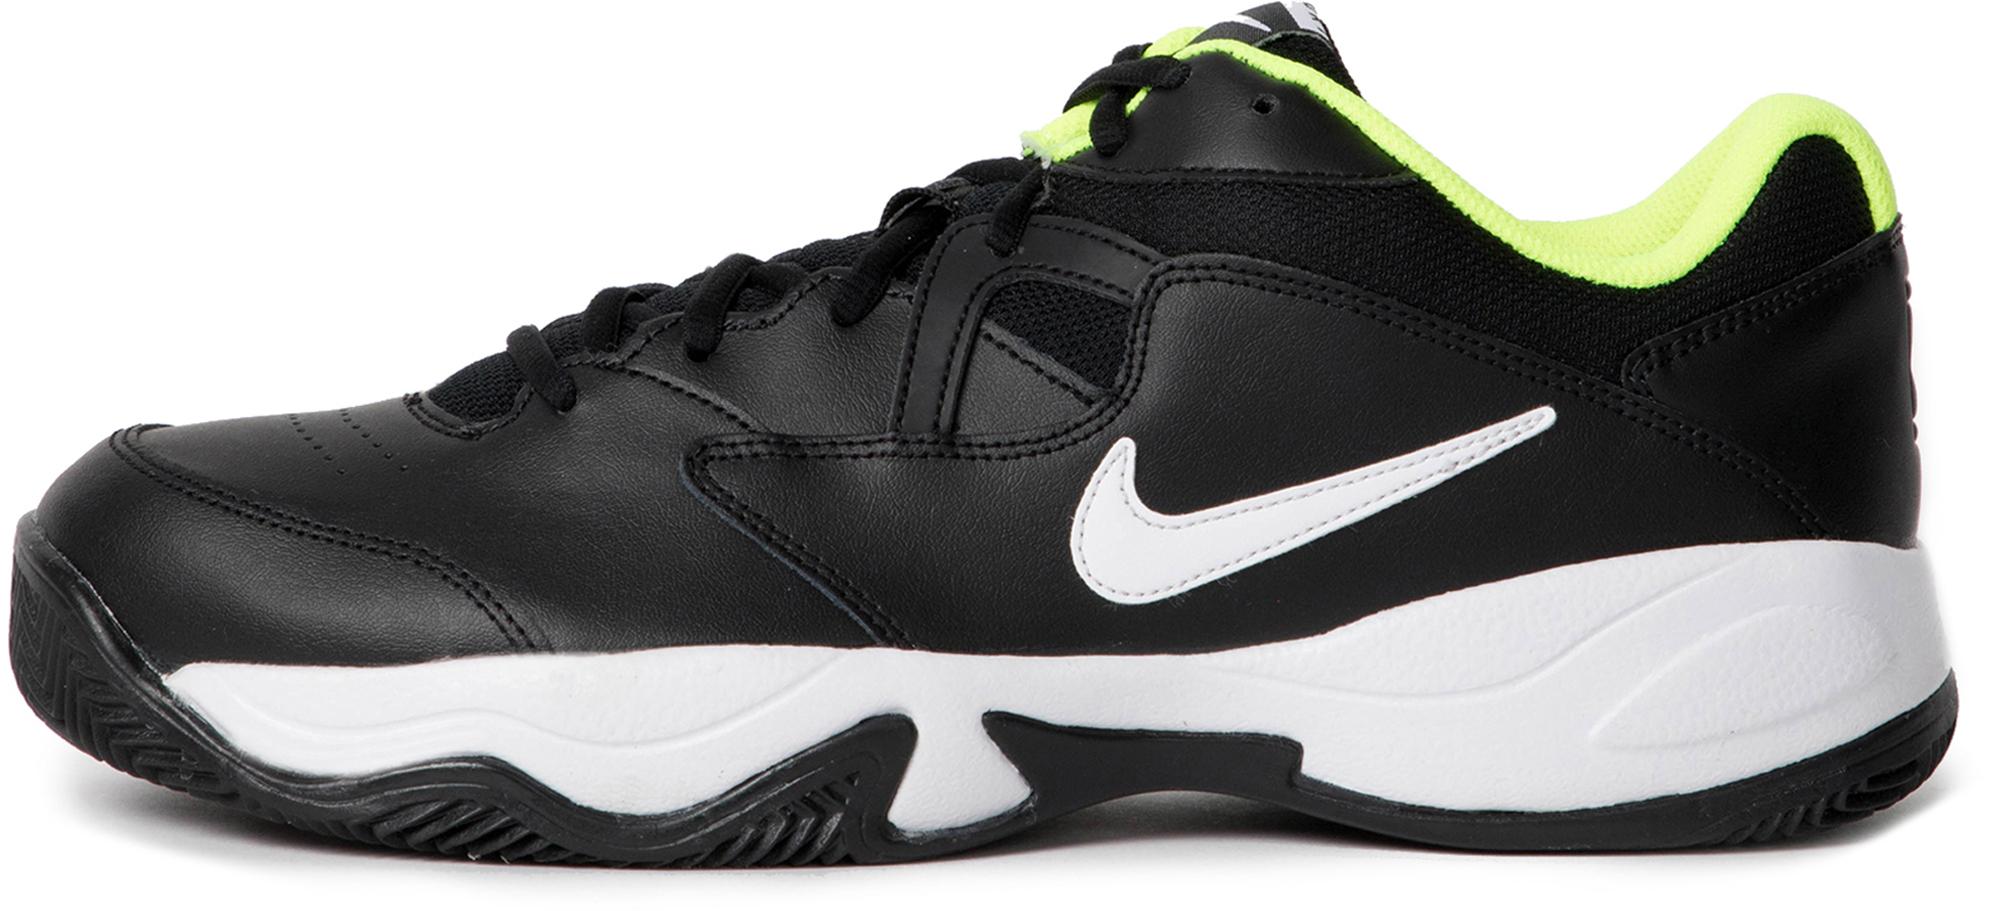 Nike Кроссовки мужские Nike Court Lite 2 Cly, размер 41